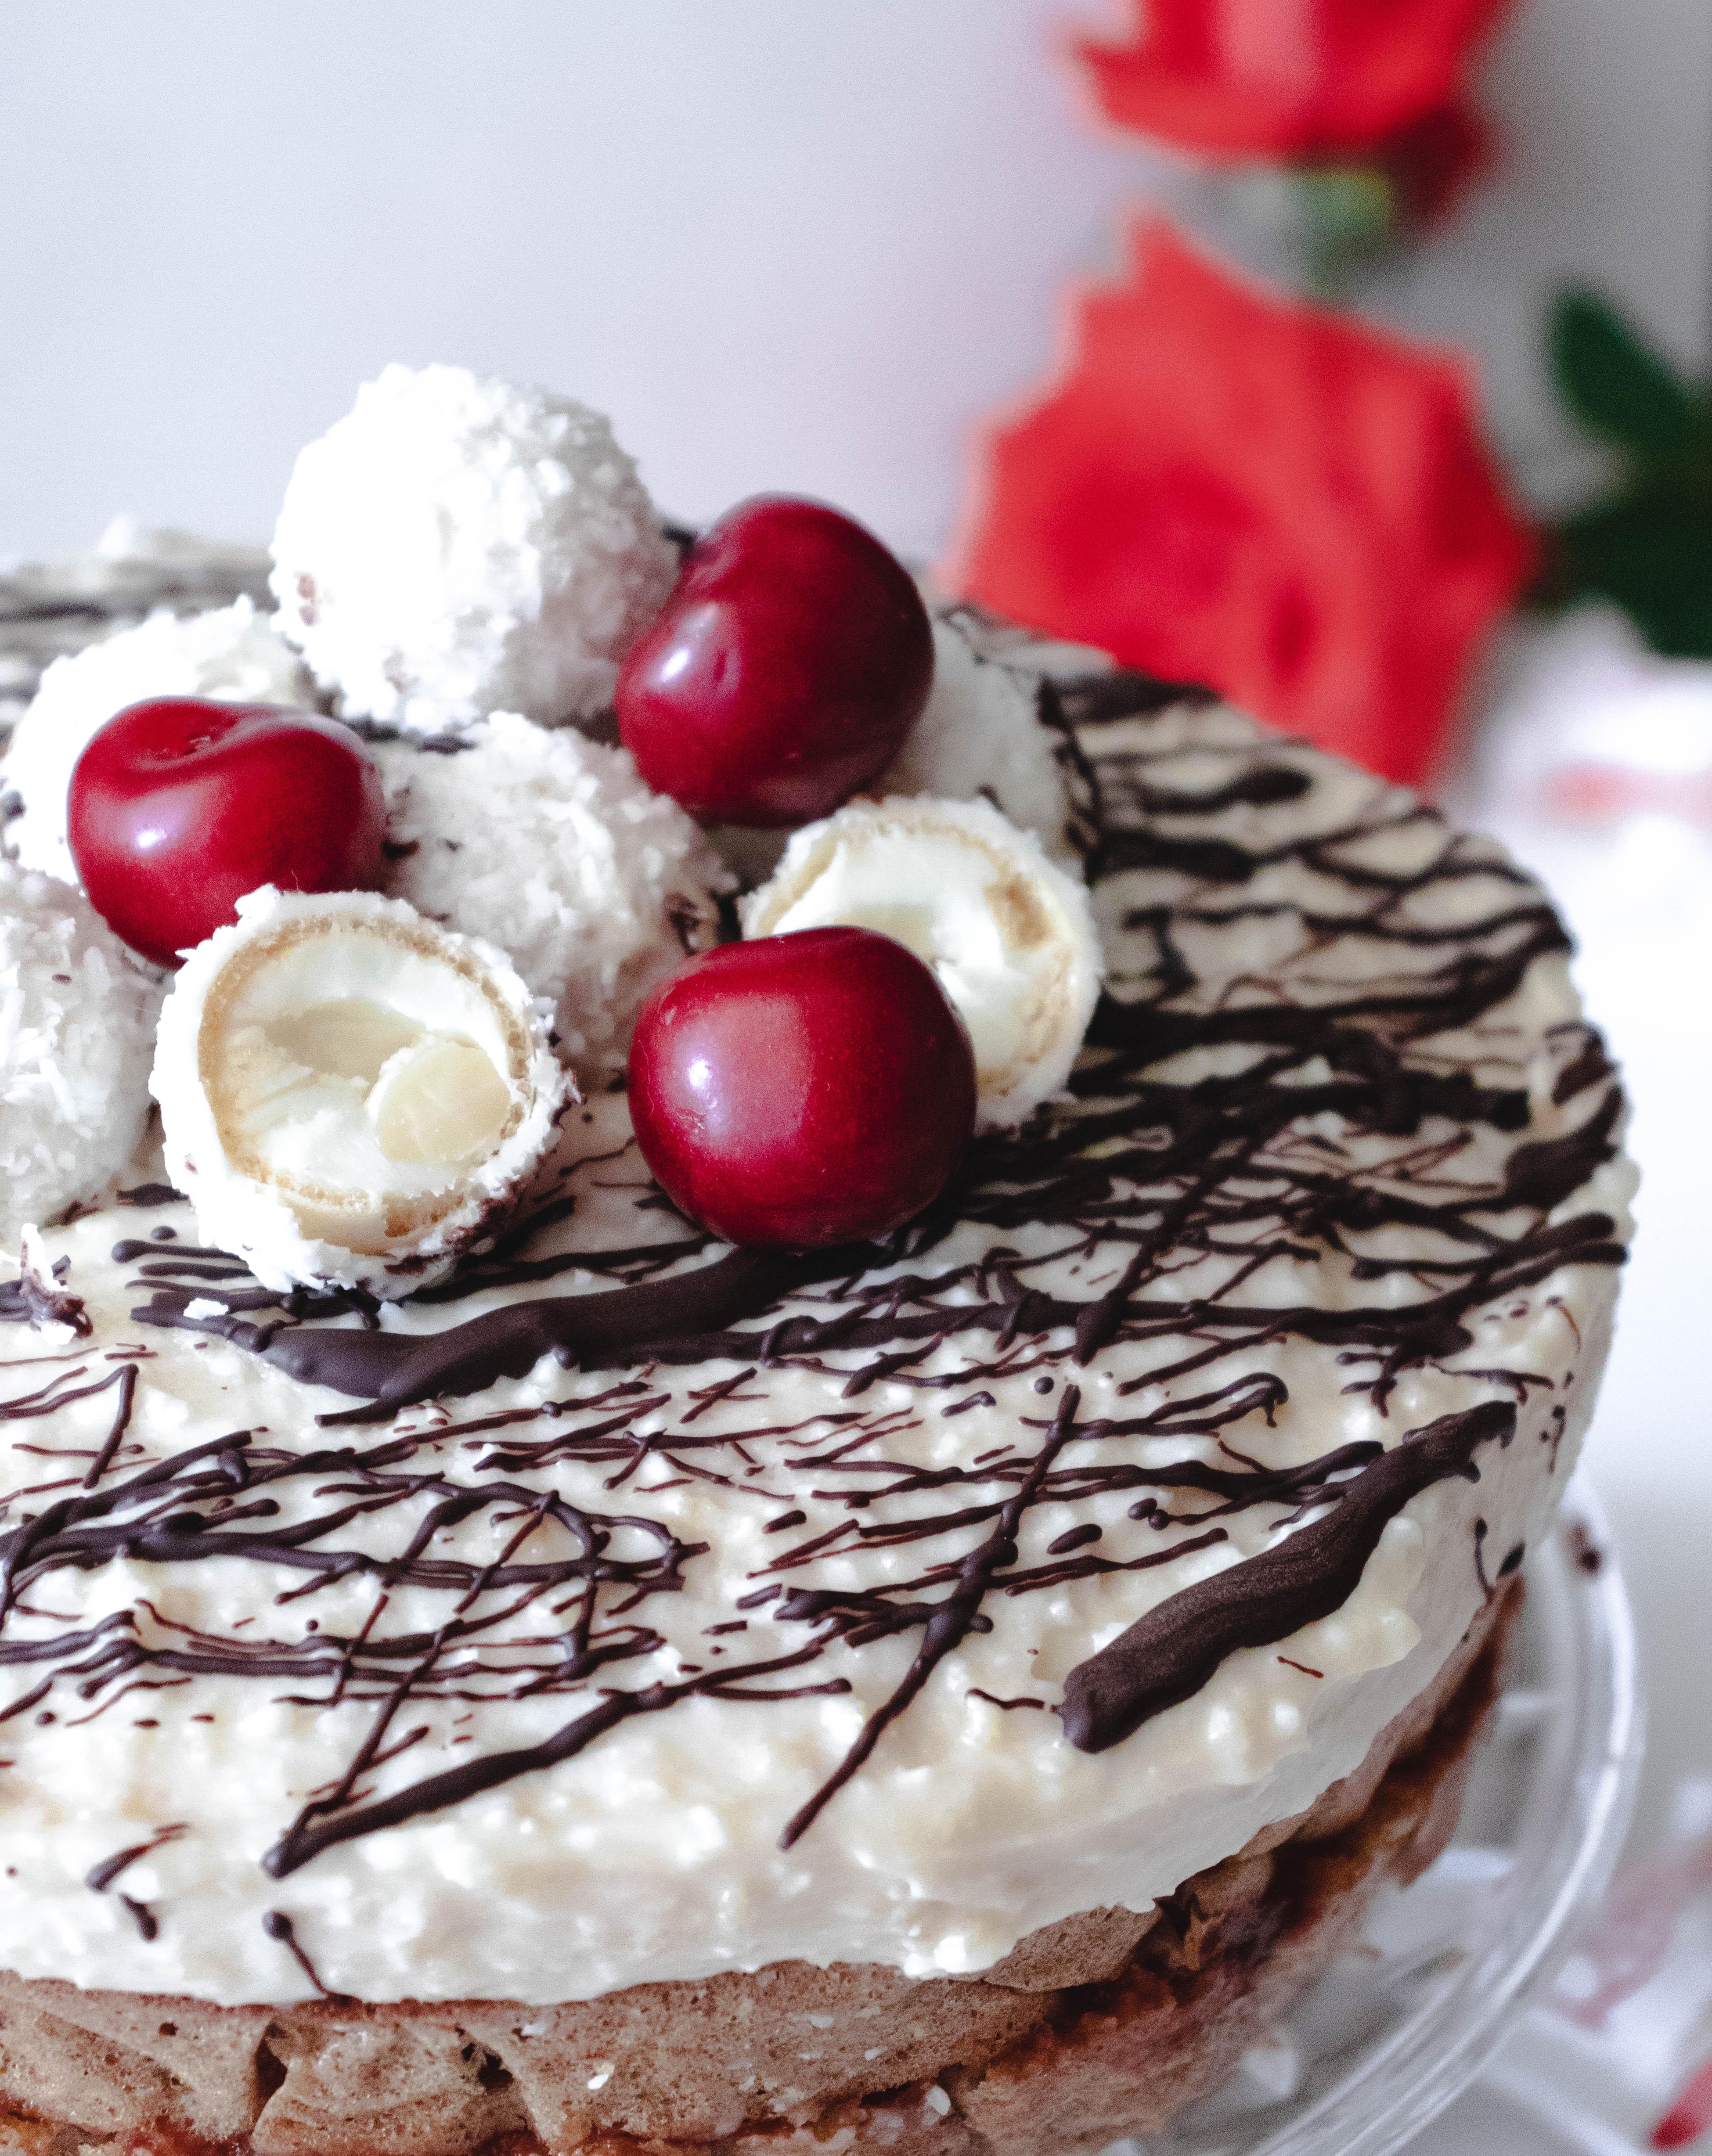 Szuper könnyű raffaello torta recept